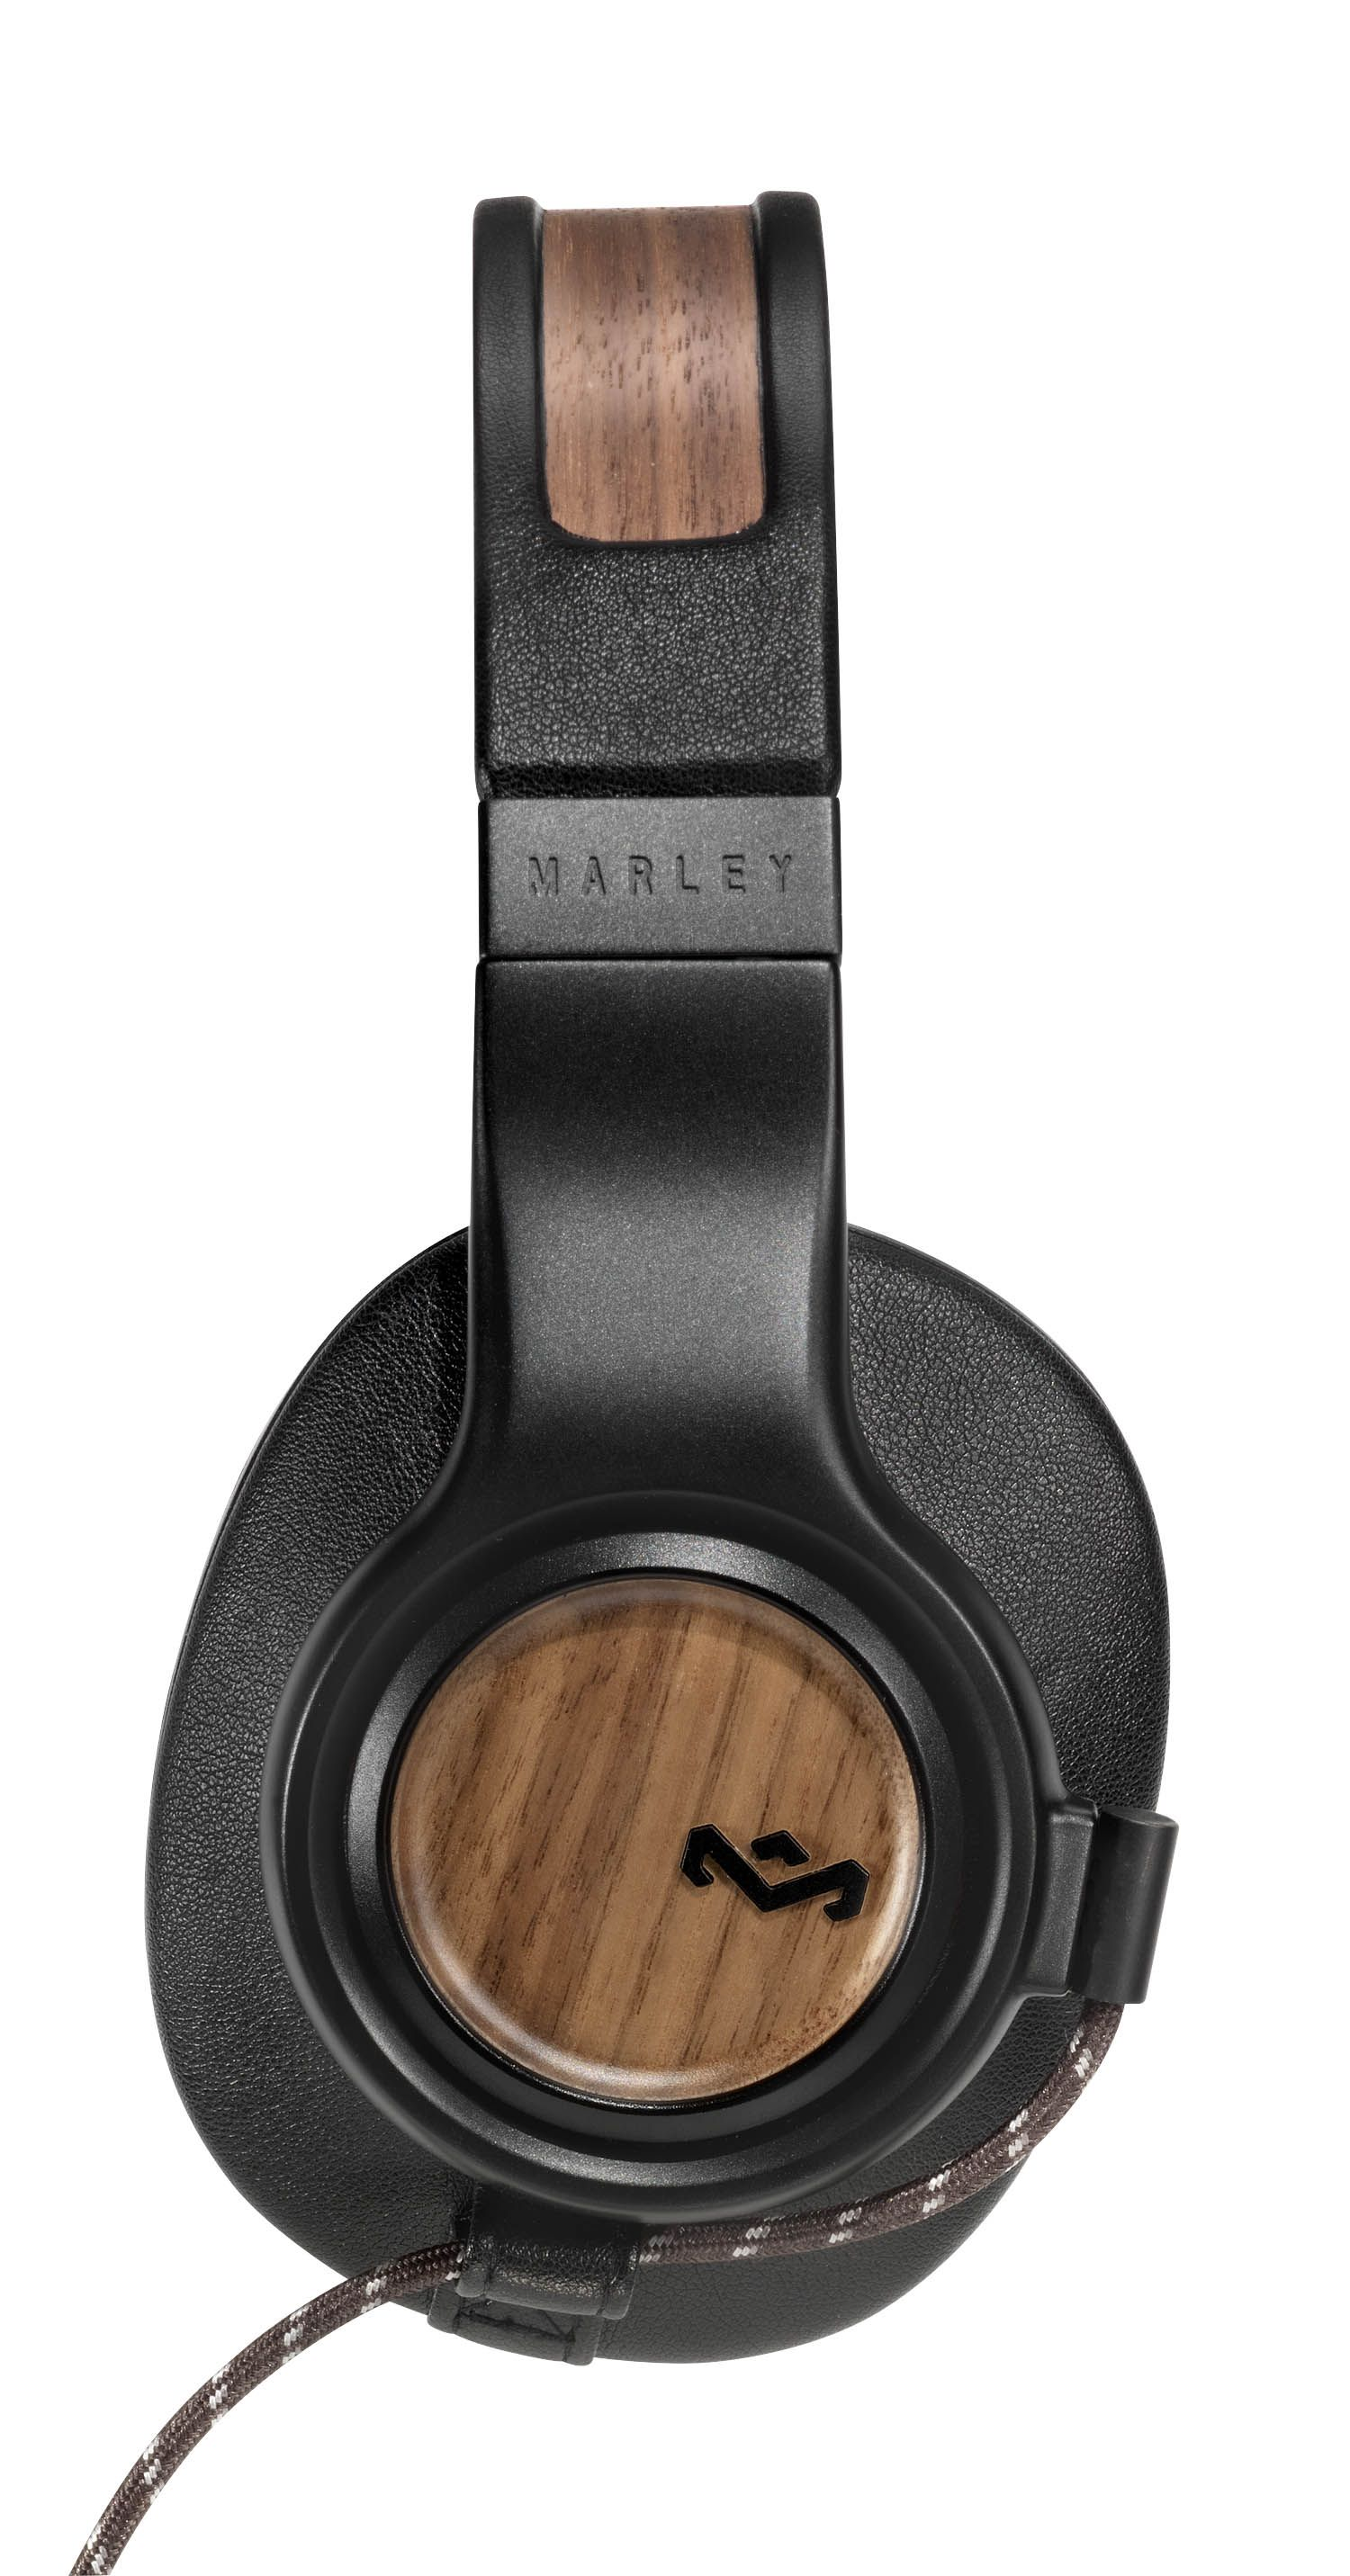 House of Marley Legend Headphones | Man of Many